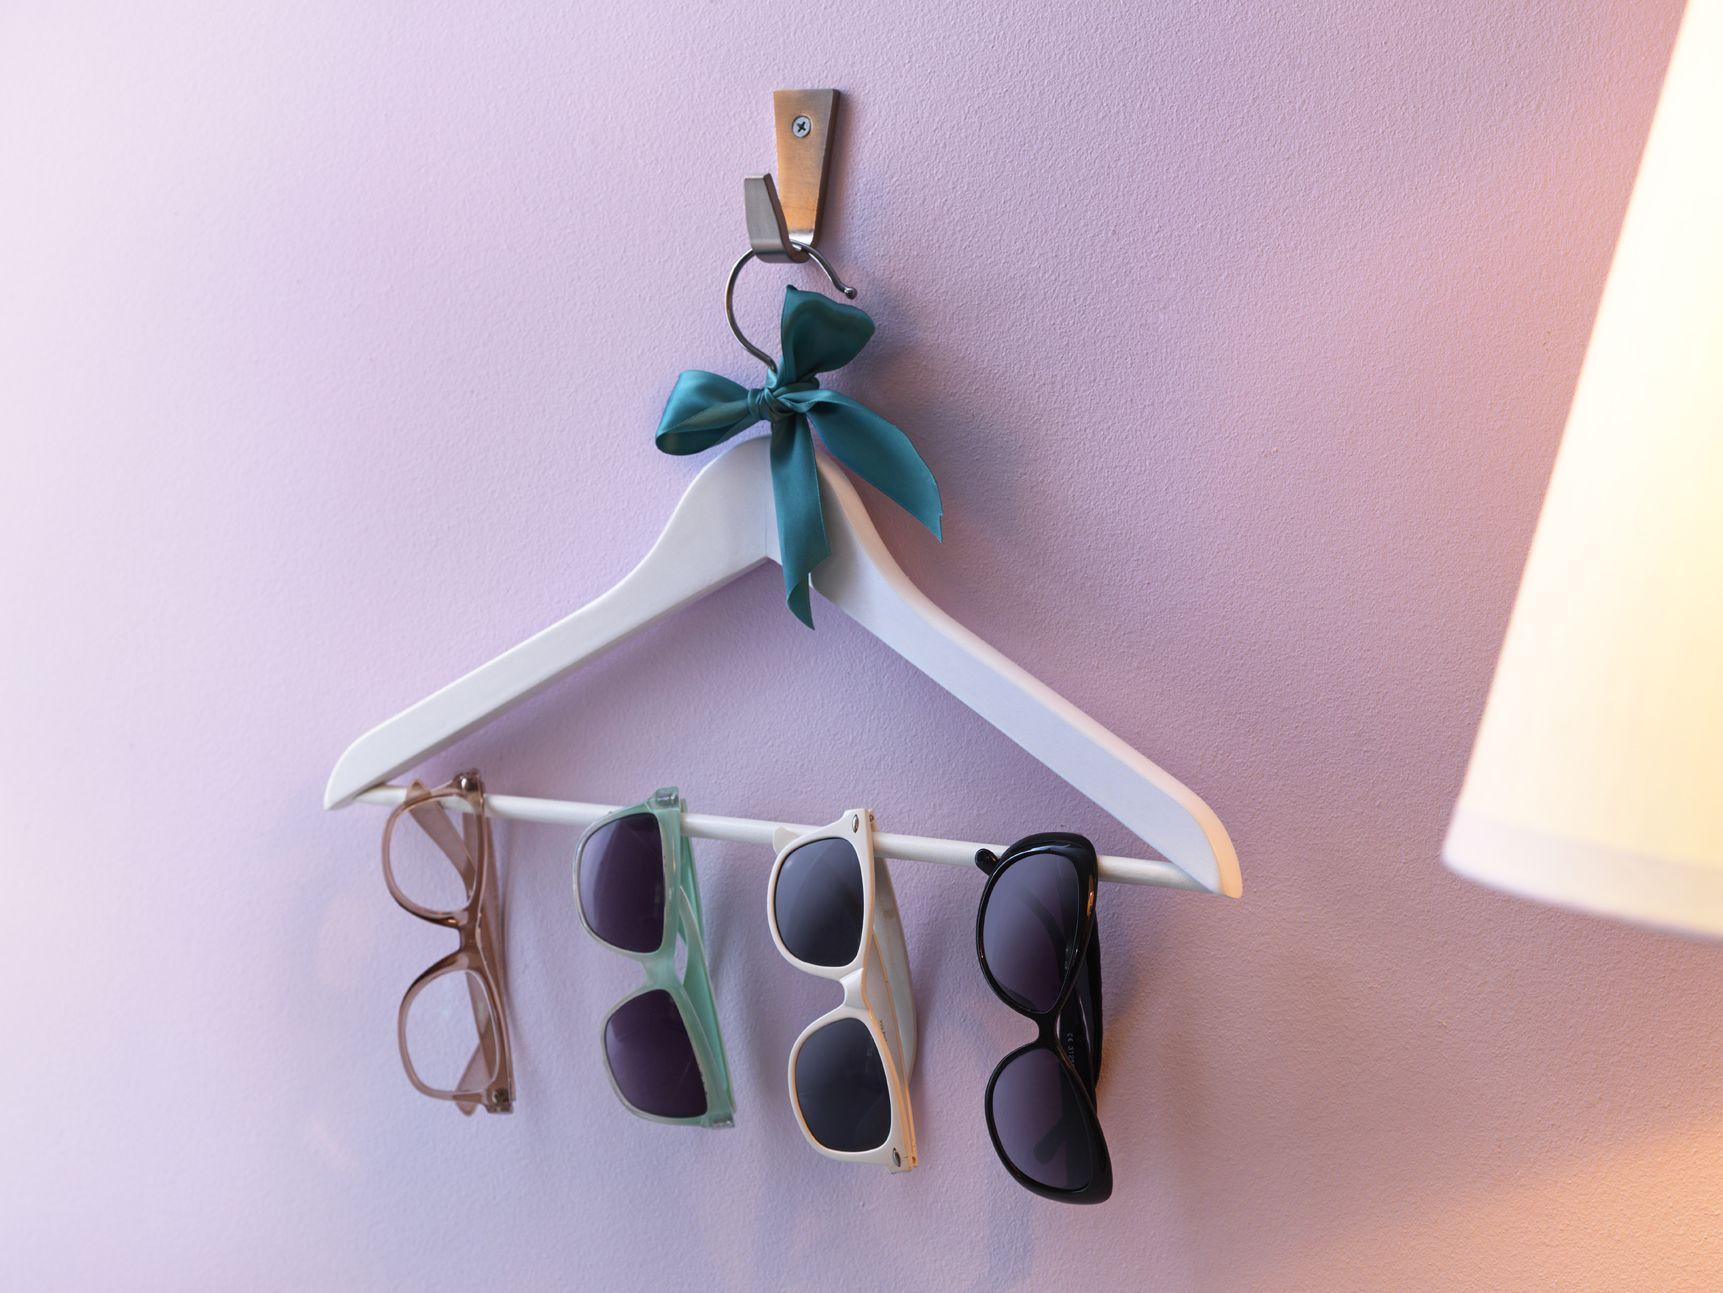 Ikea Hosenbügel ikea österreich inspiration kinder hosenbügel bumerang